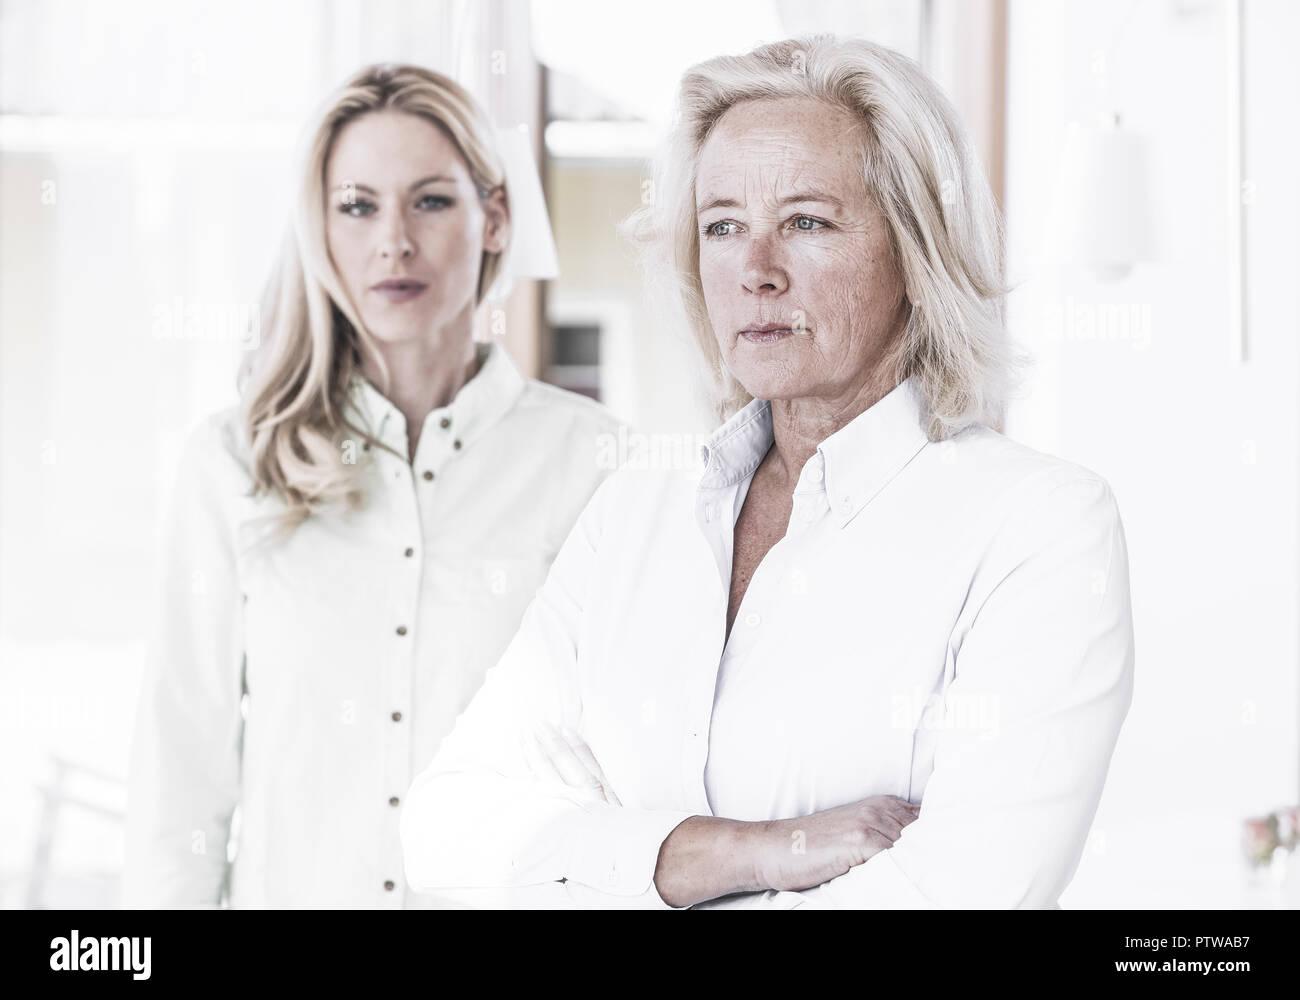 Mutter mit erwachsener Tochter, ernster Blick (model-released) - Stock Image